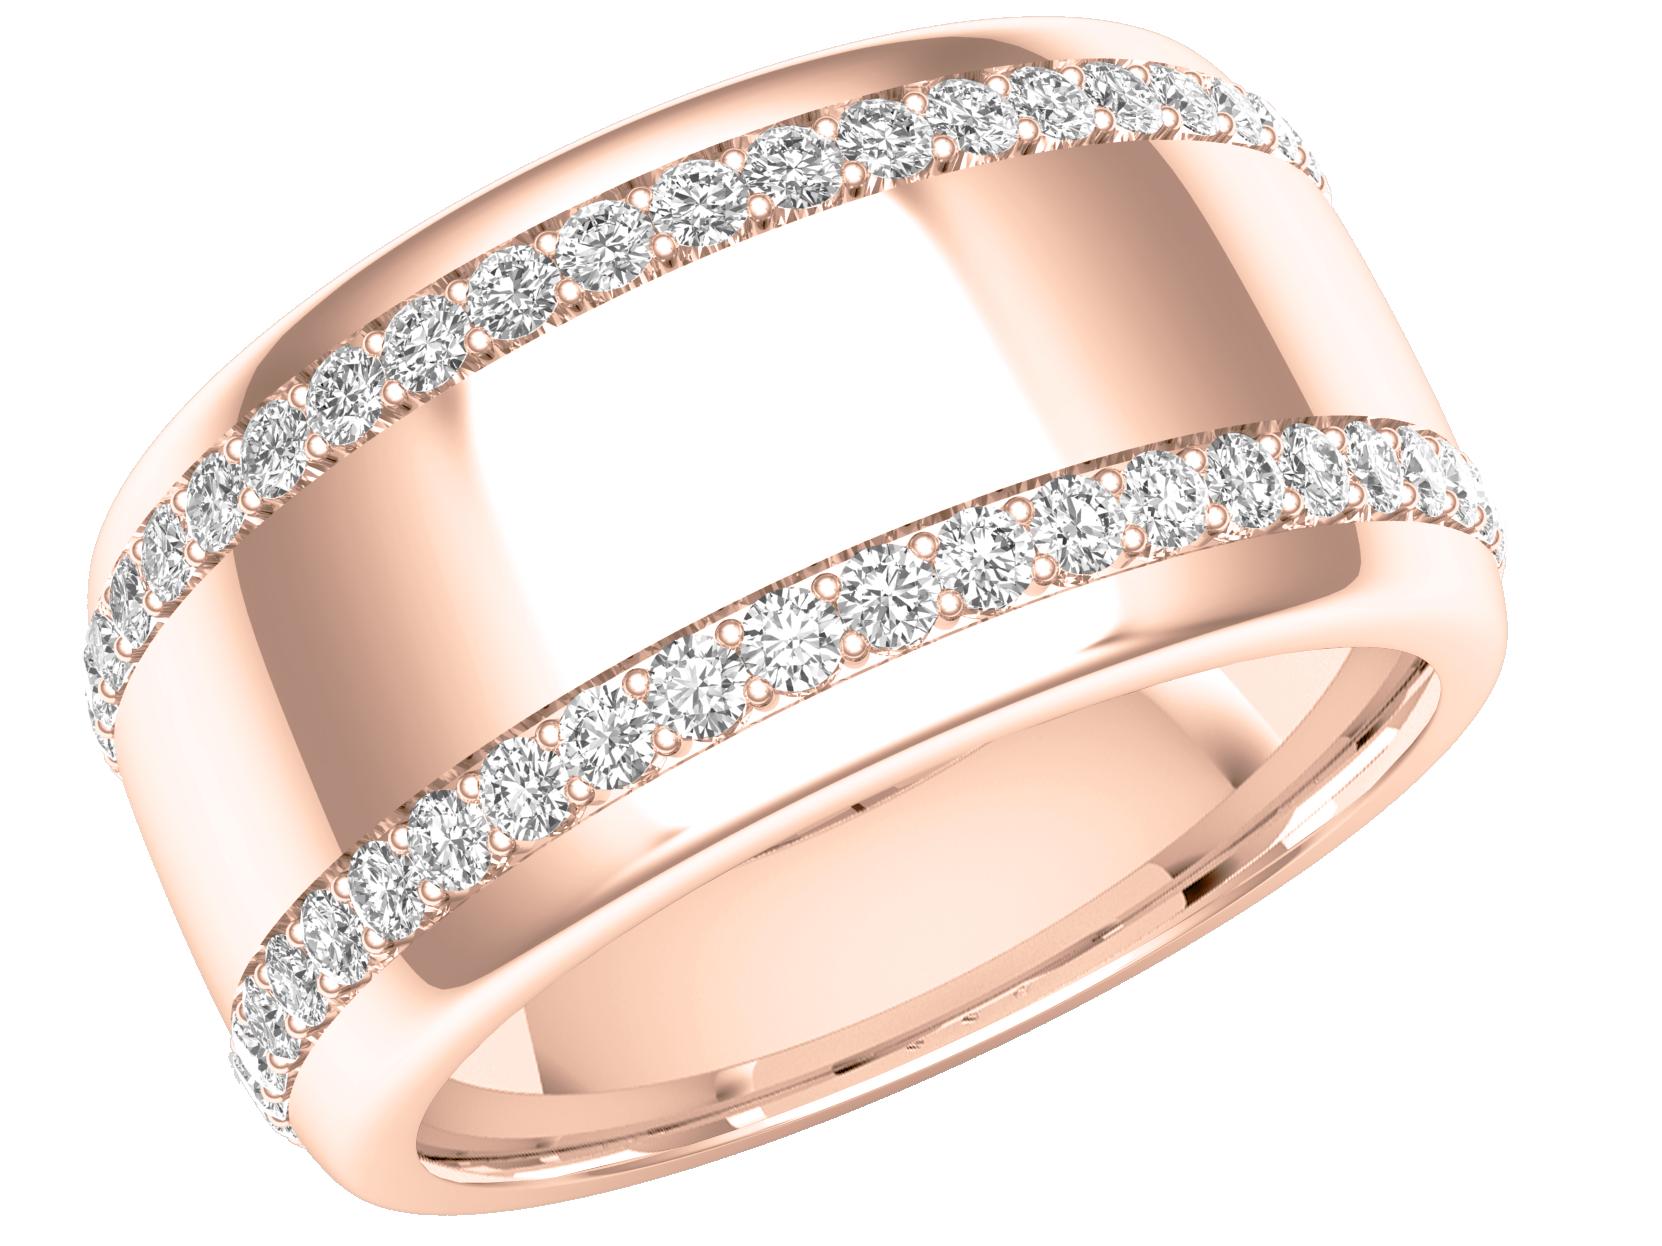 Verigheta Cu Diamantinel Eternity Dama Aur Roz 18kt Cu Doua Randuri